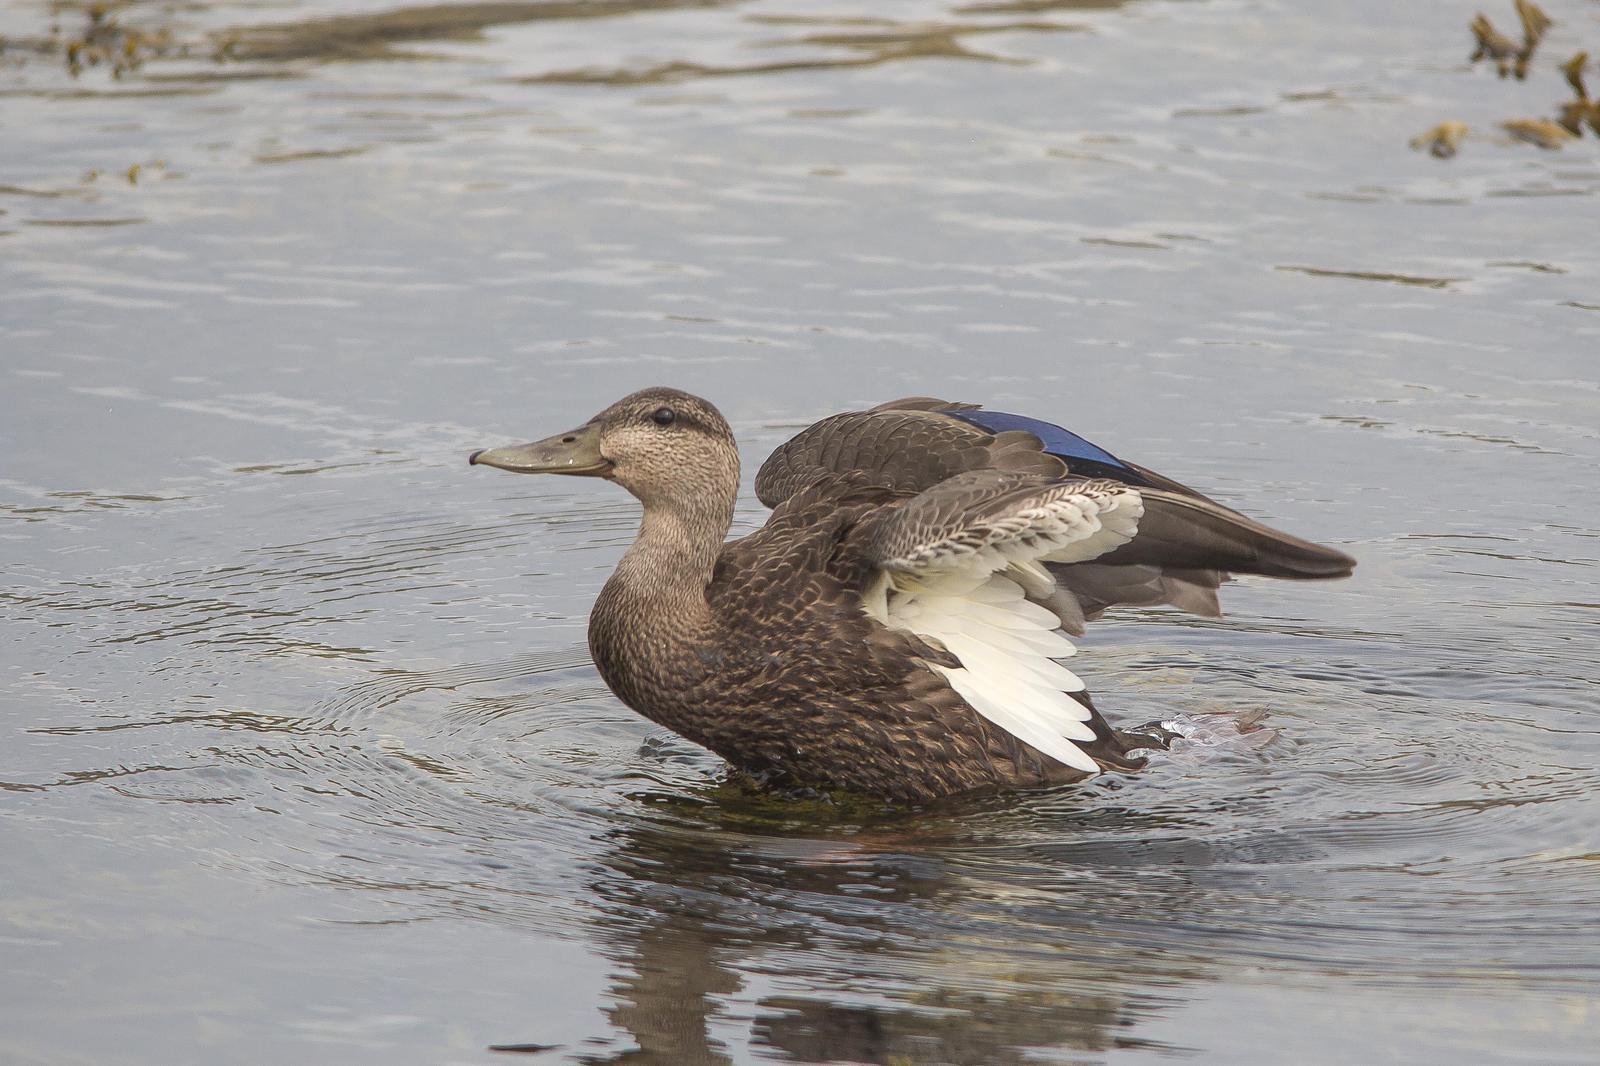 American Black Duck Photo by Marie-France Rivard